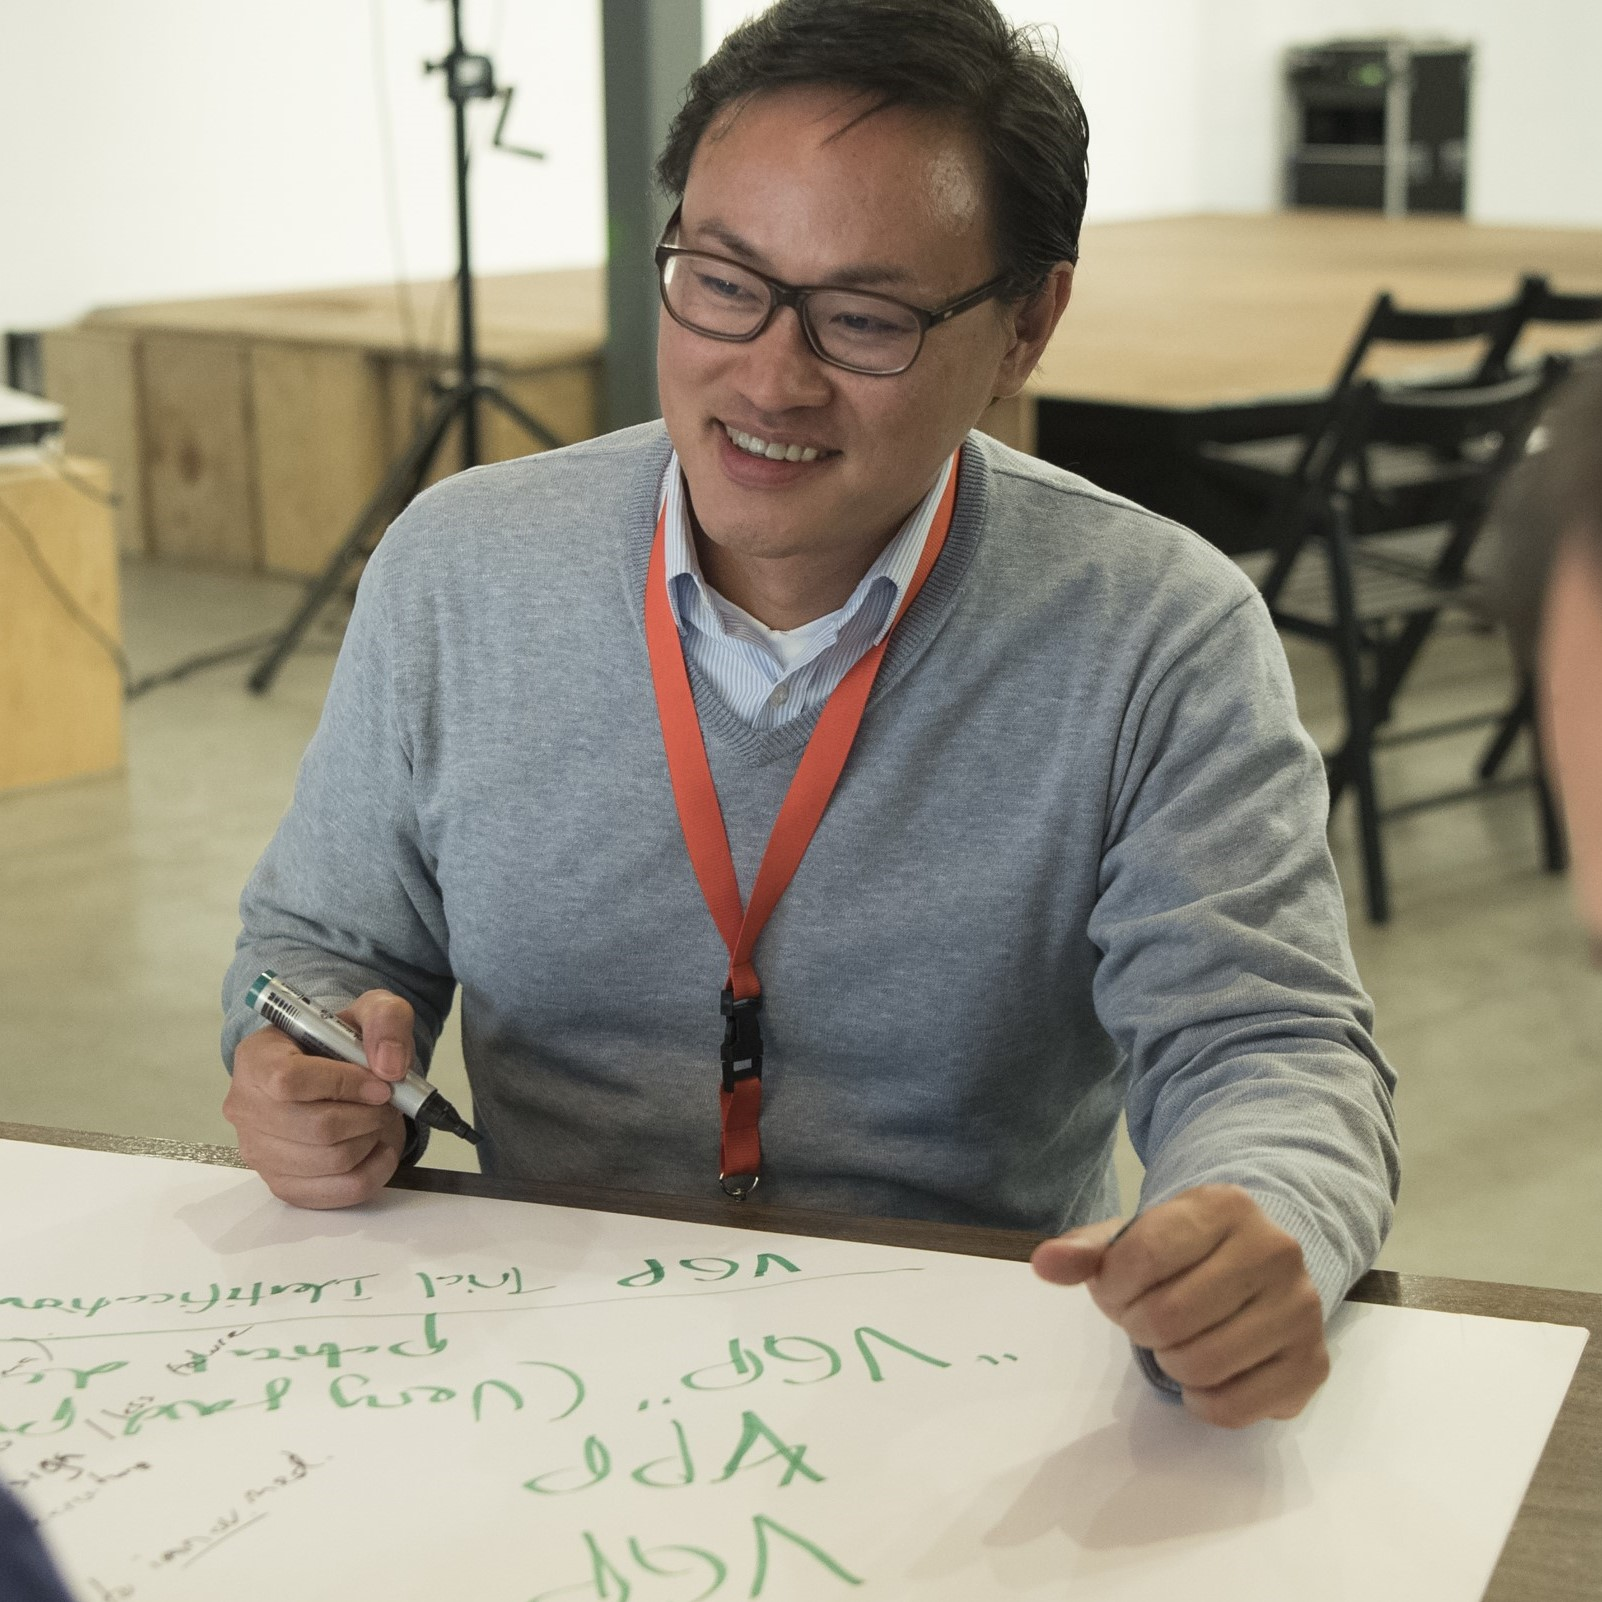 brainstorming employee - dayone